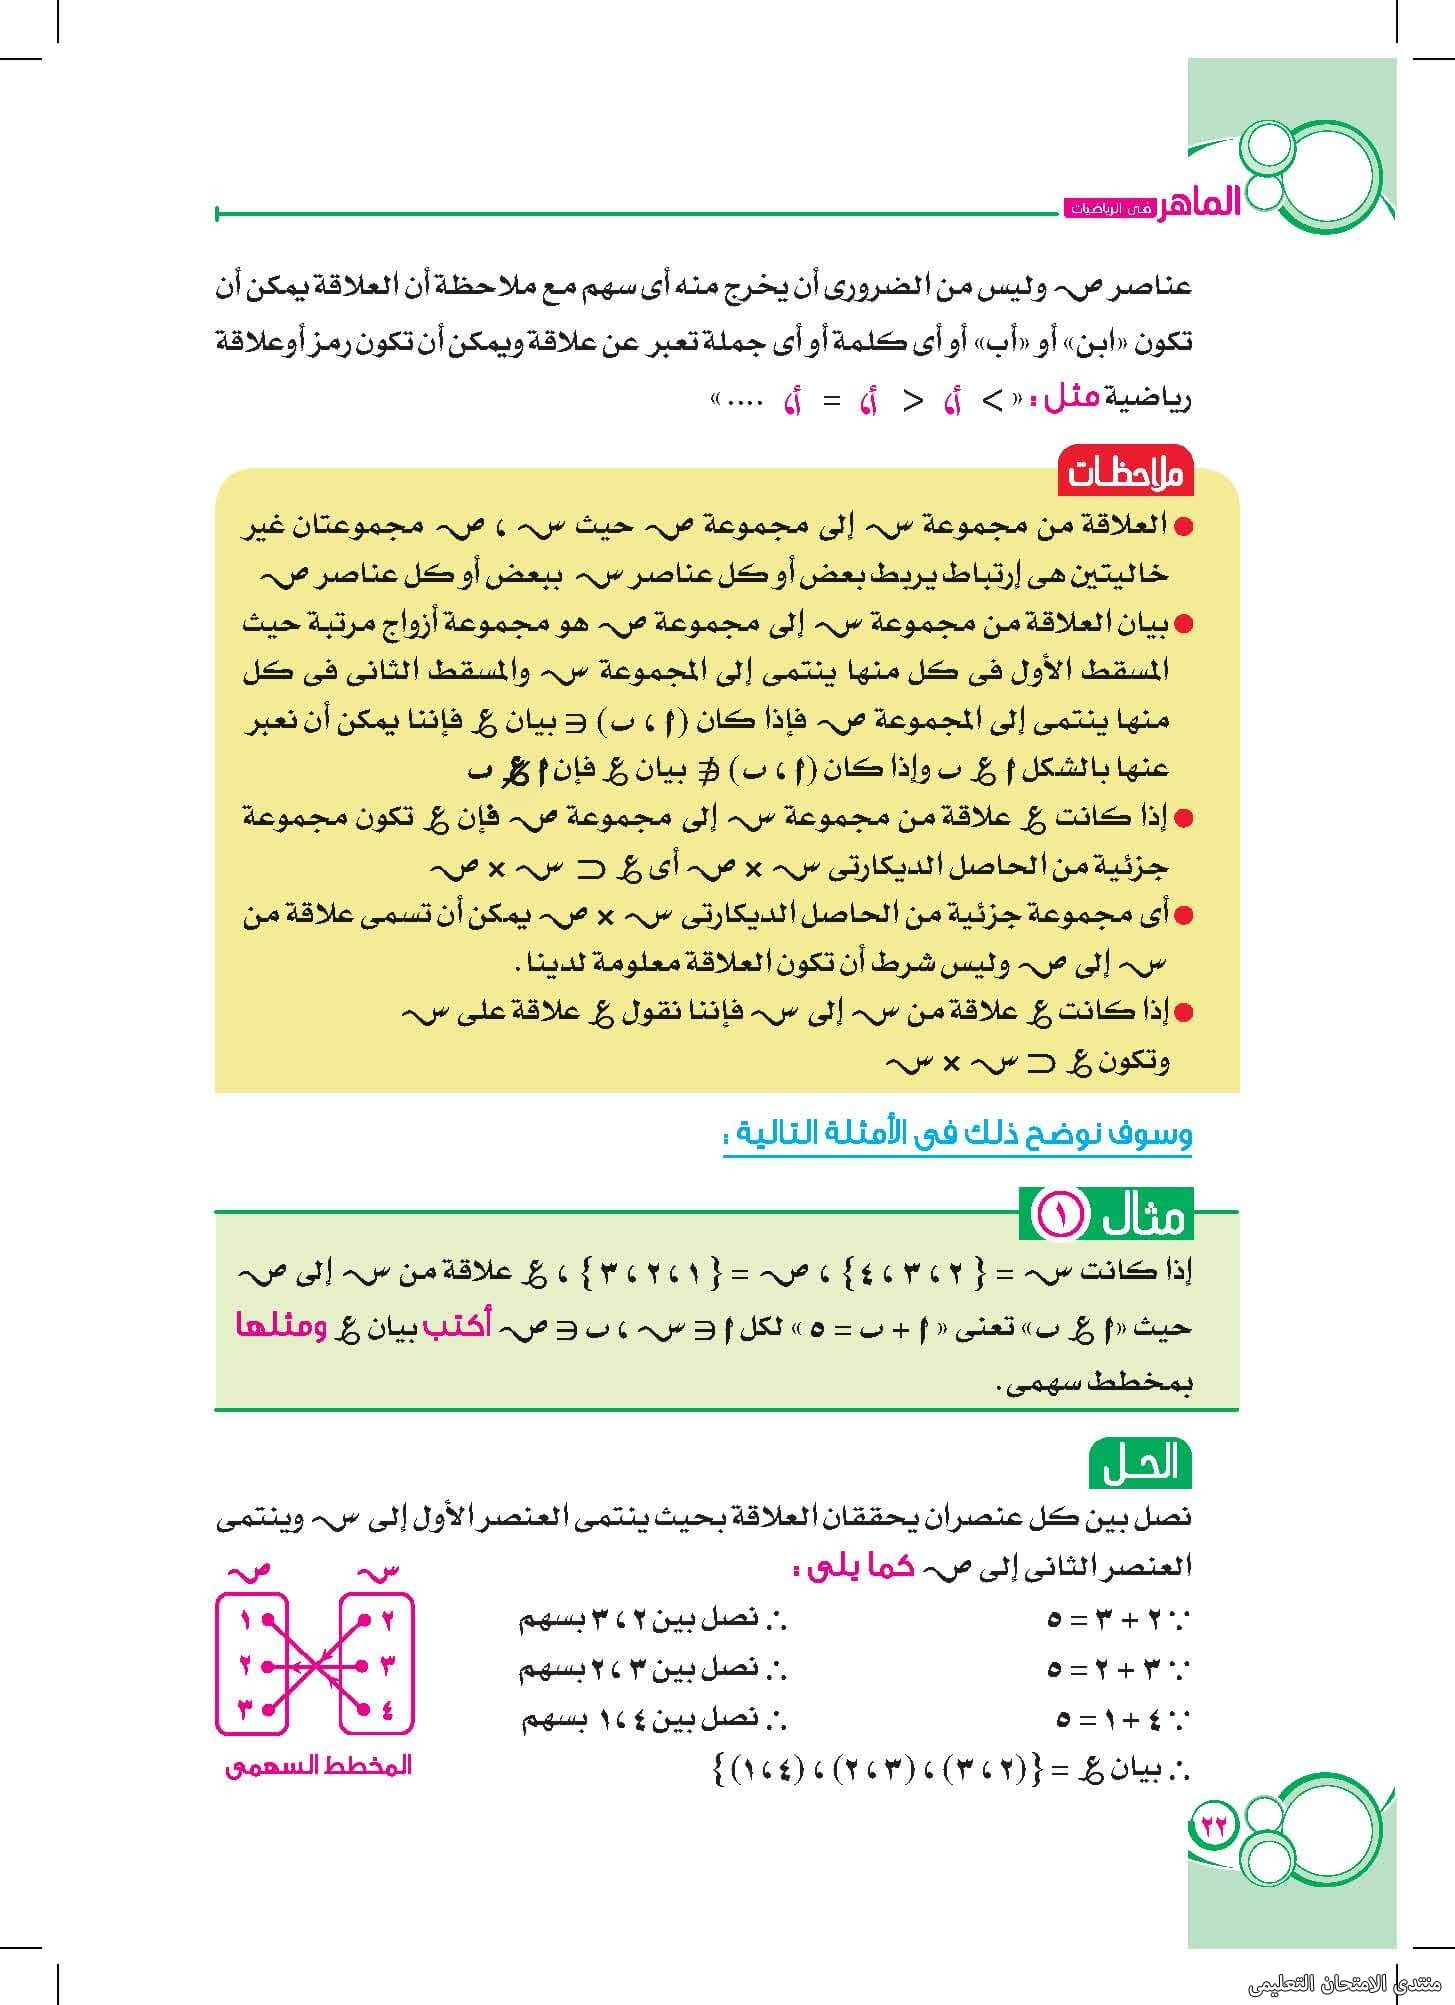 exam-eg.com_163155606968431.jpg